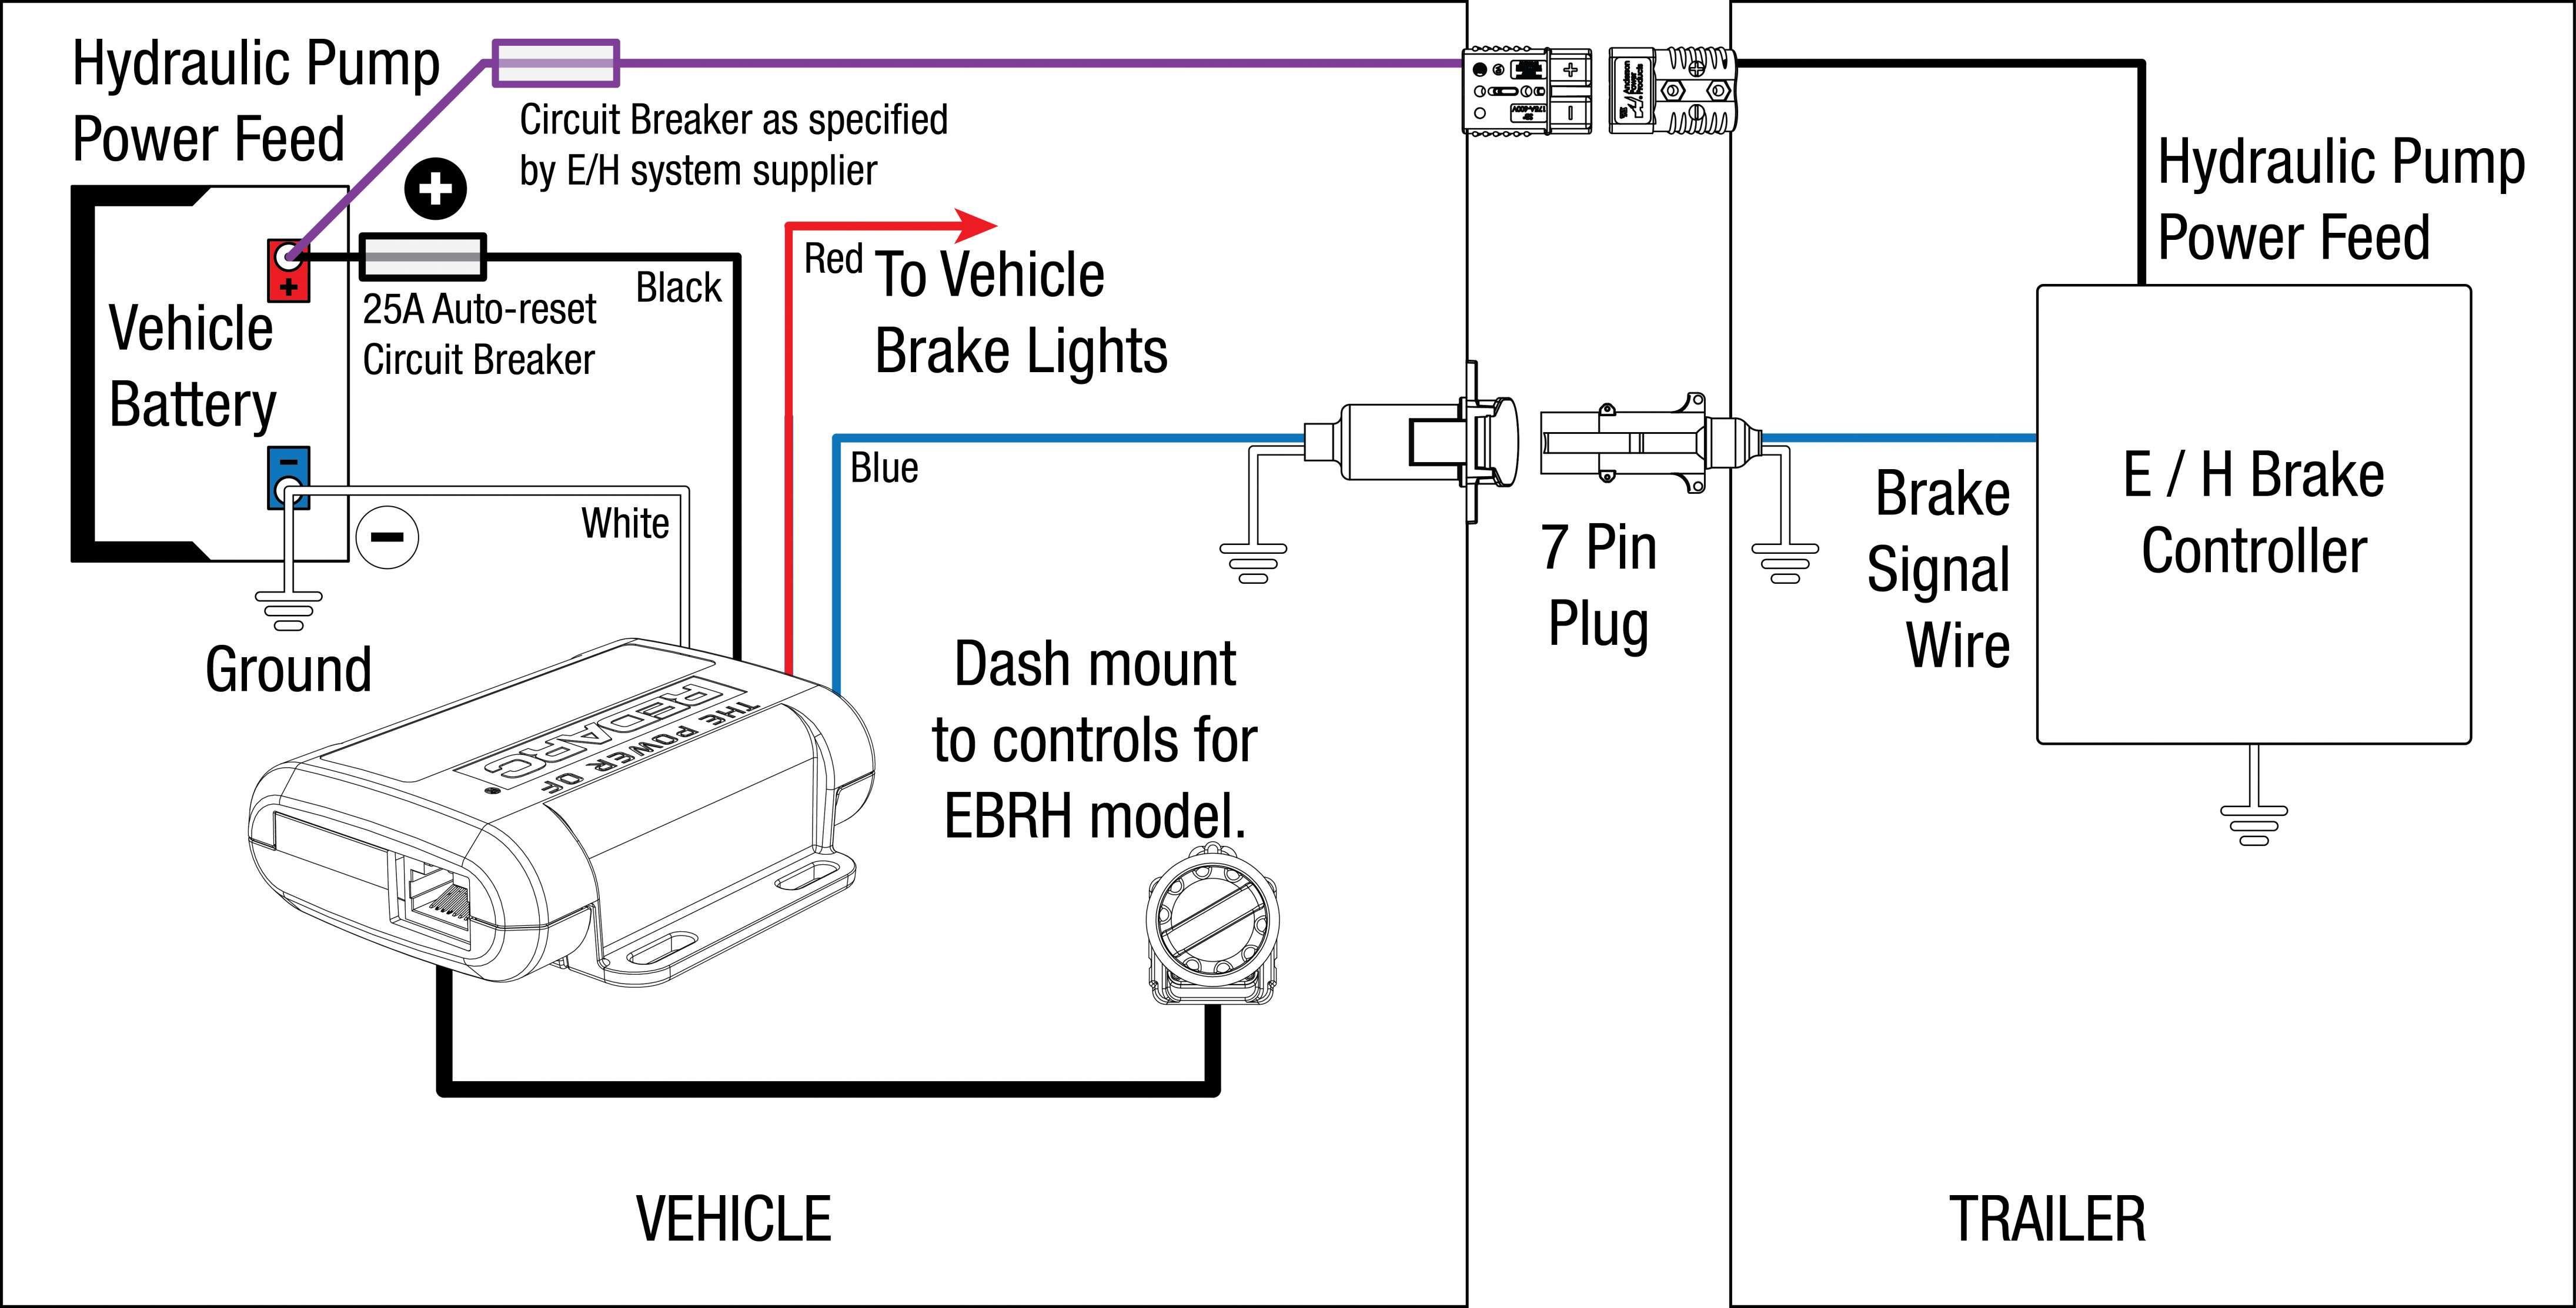 18 Electric Trailer Brakes Wiring Diagram Australia Trailer Light Wiring Trailer Wiring Diagram Diagram